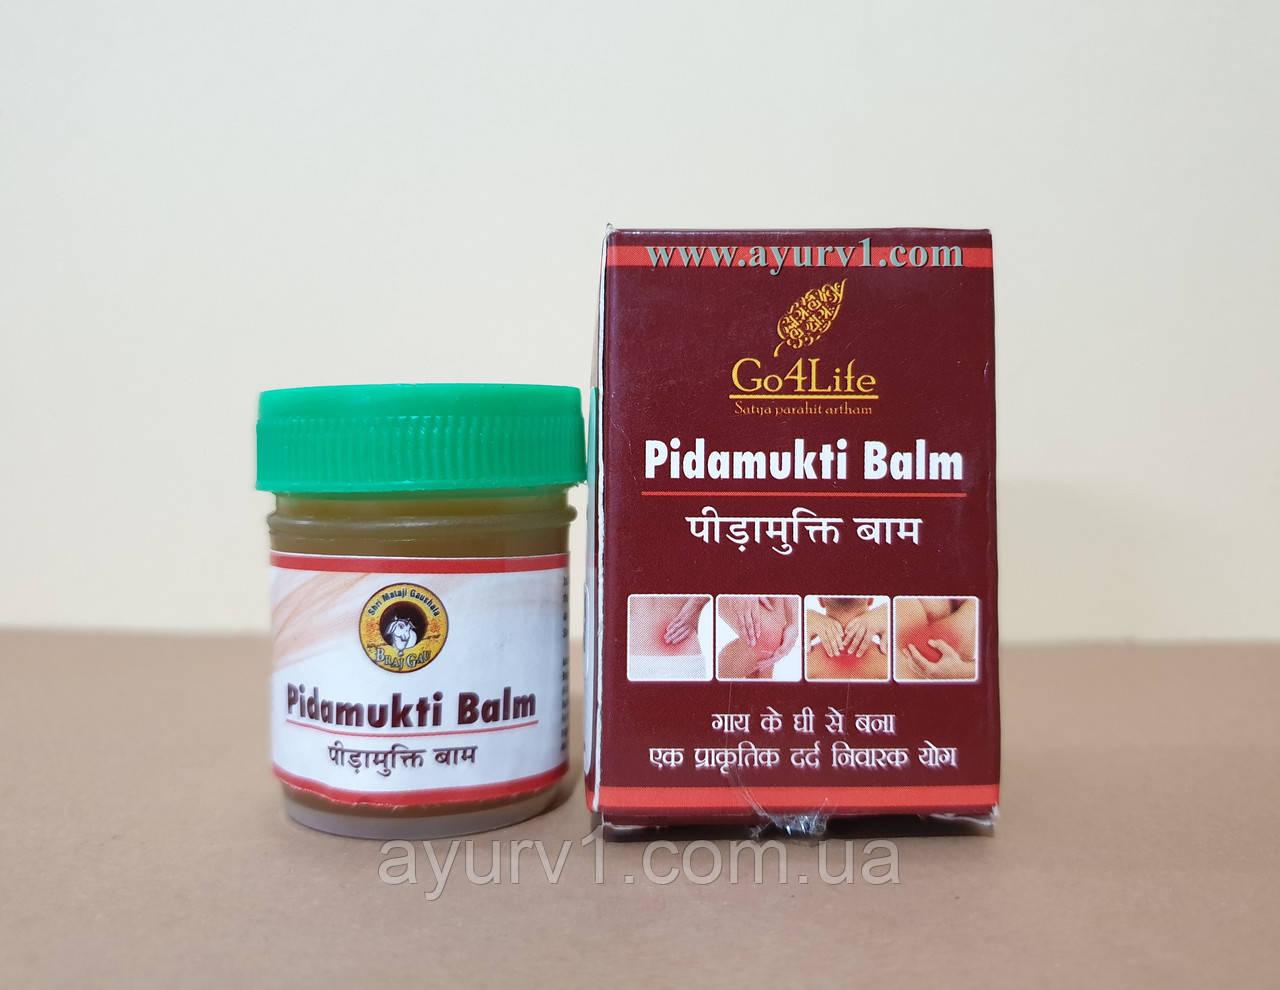 Мазь от боли, защемление, артроз Гомата, Pidamukti Balm Go4Life, 20 г.